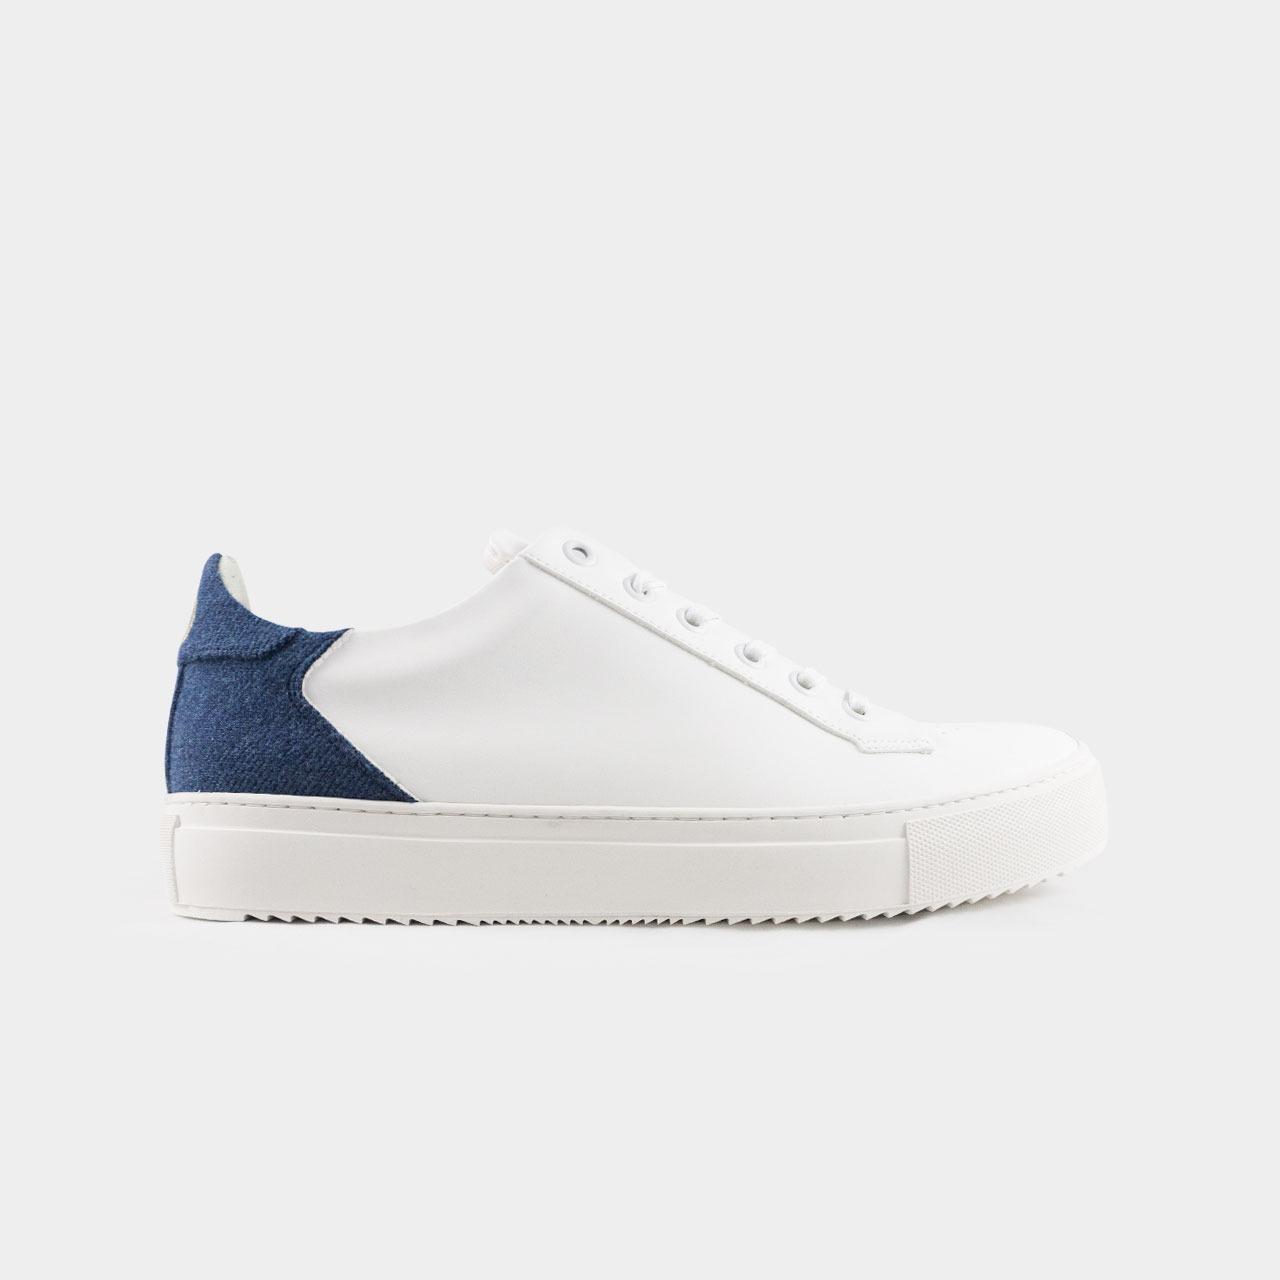 Basket-vegan-Epsilon-blanc-bleu-Subtle-shoes-1- 007347eaf88